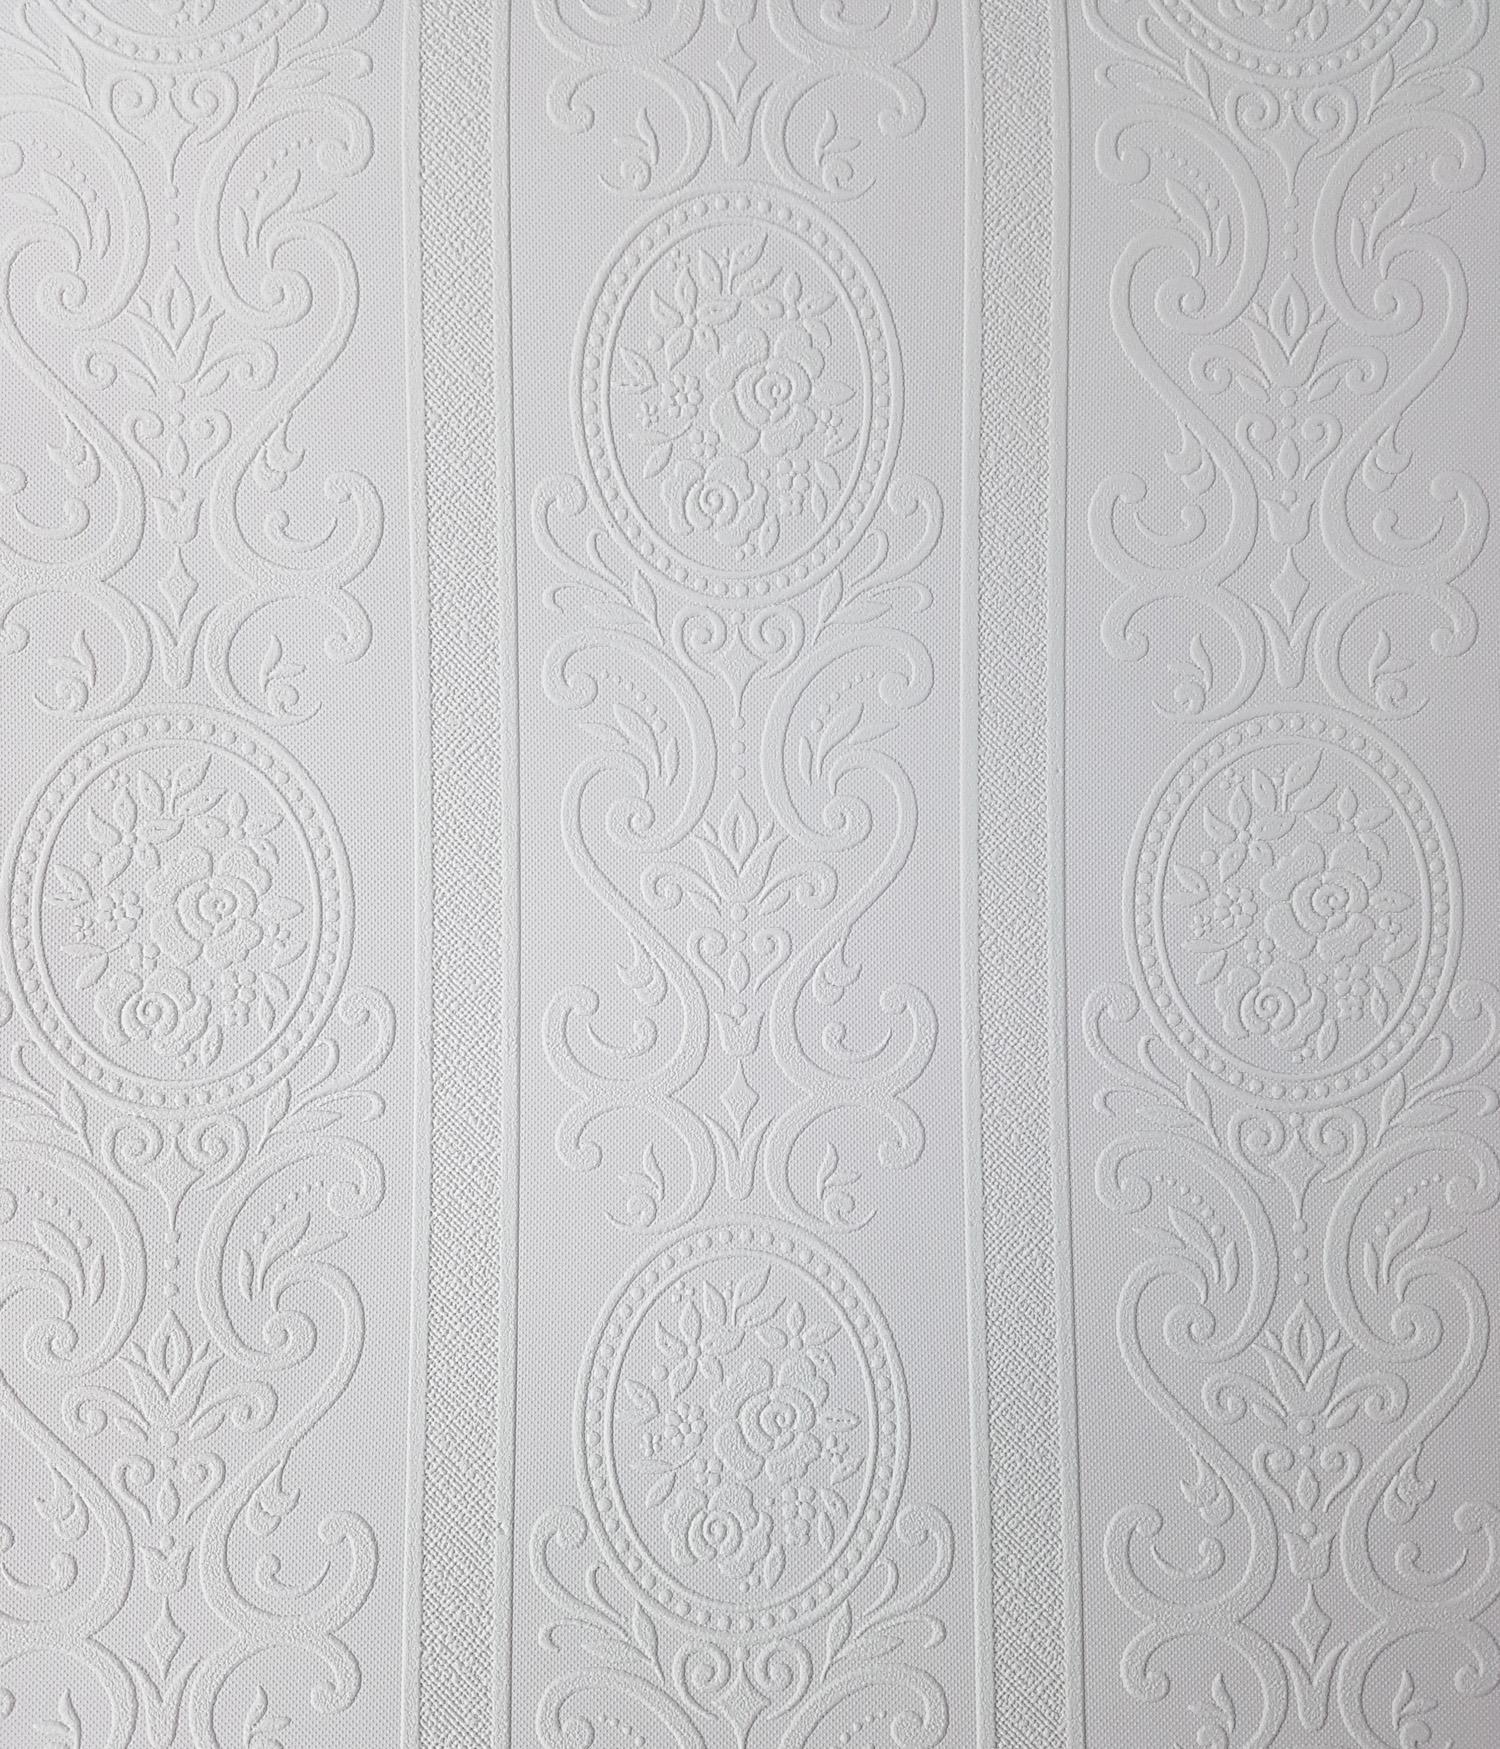 Anaglypta Louisa White Paintable Floral Stripe Wallpaper Vinyl